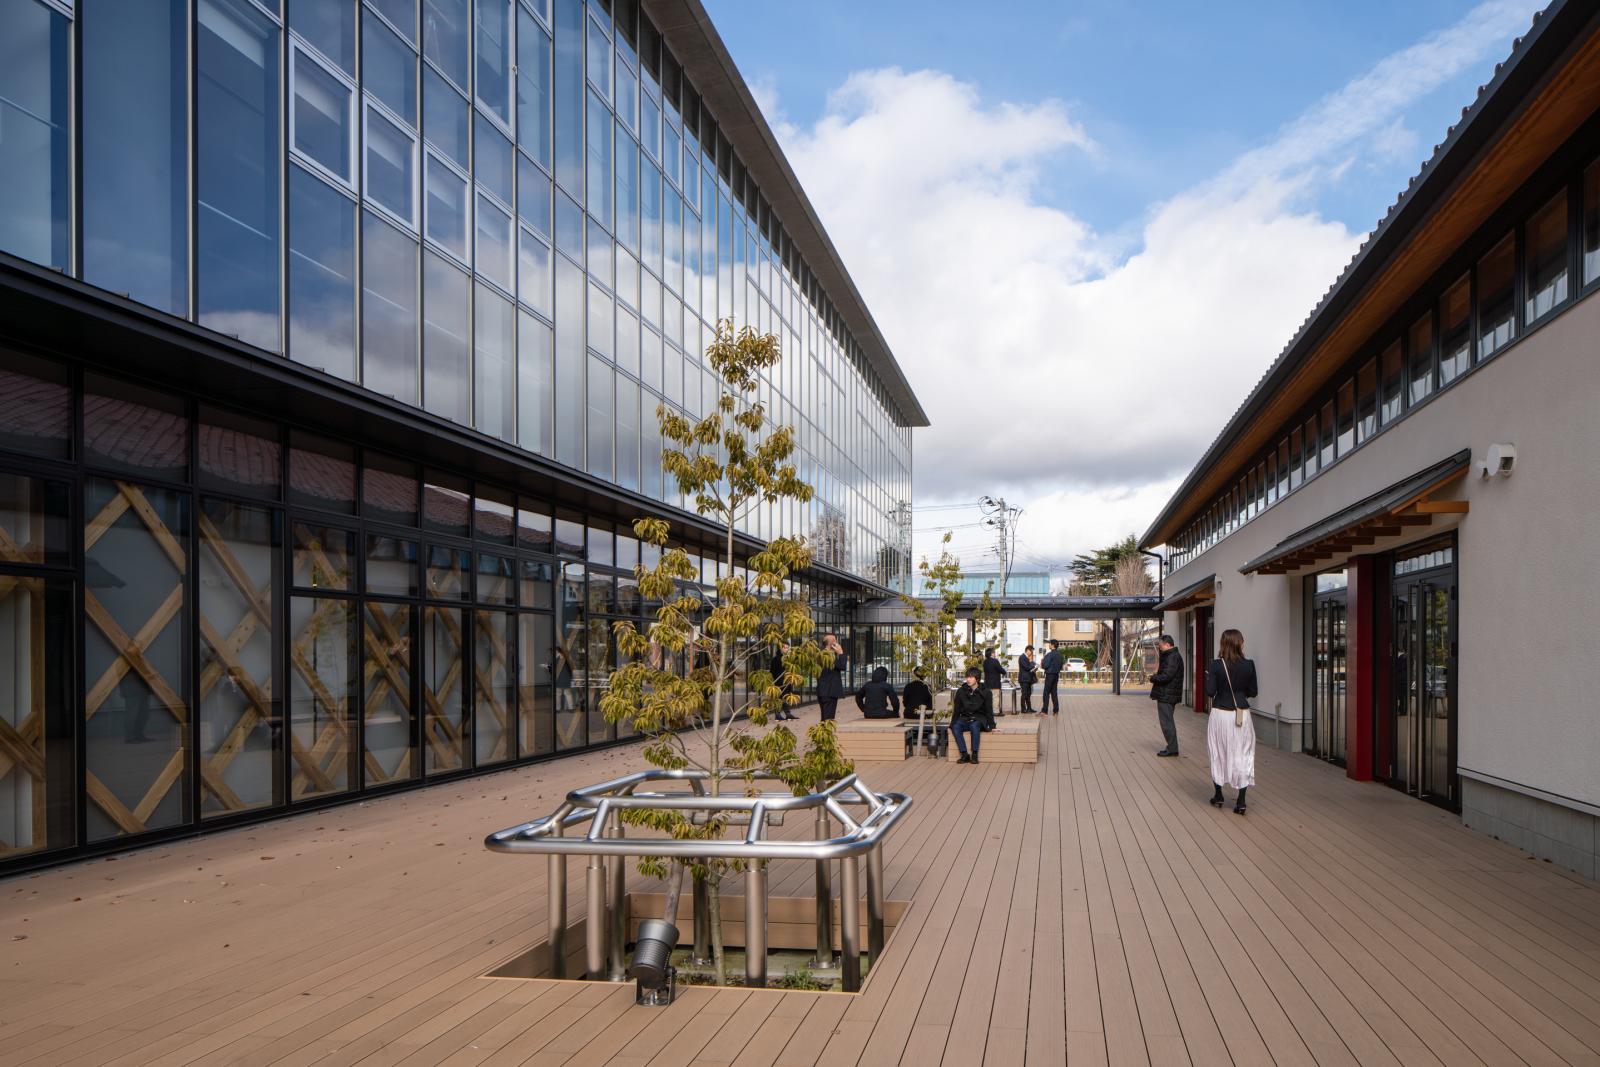 「AiCT」オフィス棟(左)と交流棟(右)はウッドデッキのパブリックスペースでつながる。市民と企業が出合う交流スペースとしての機能もある